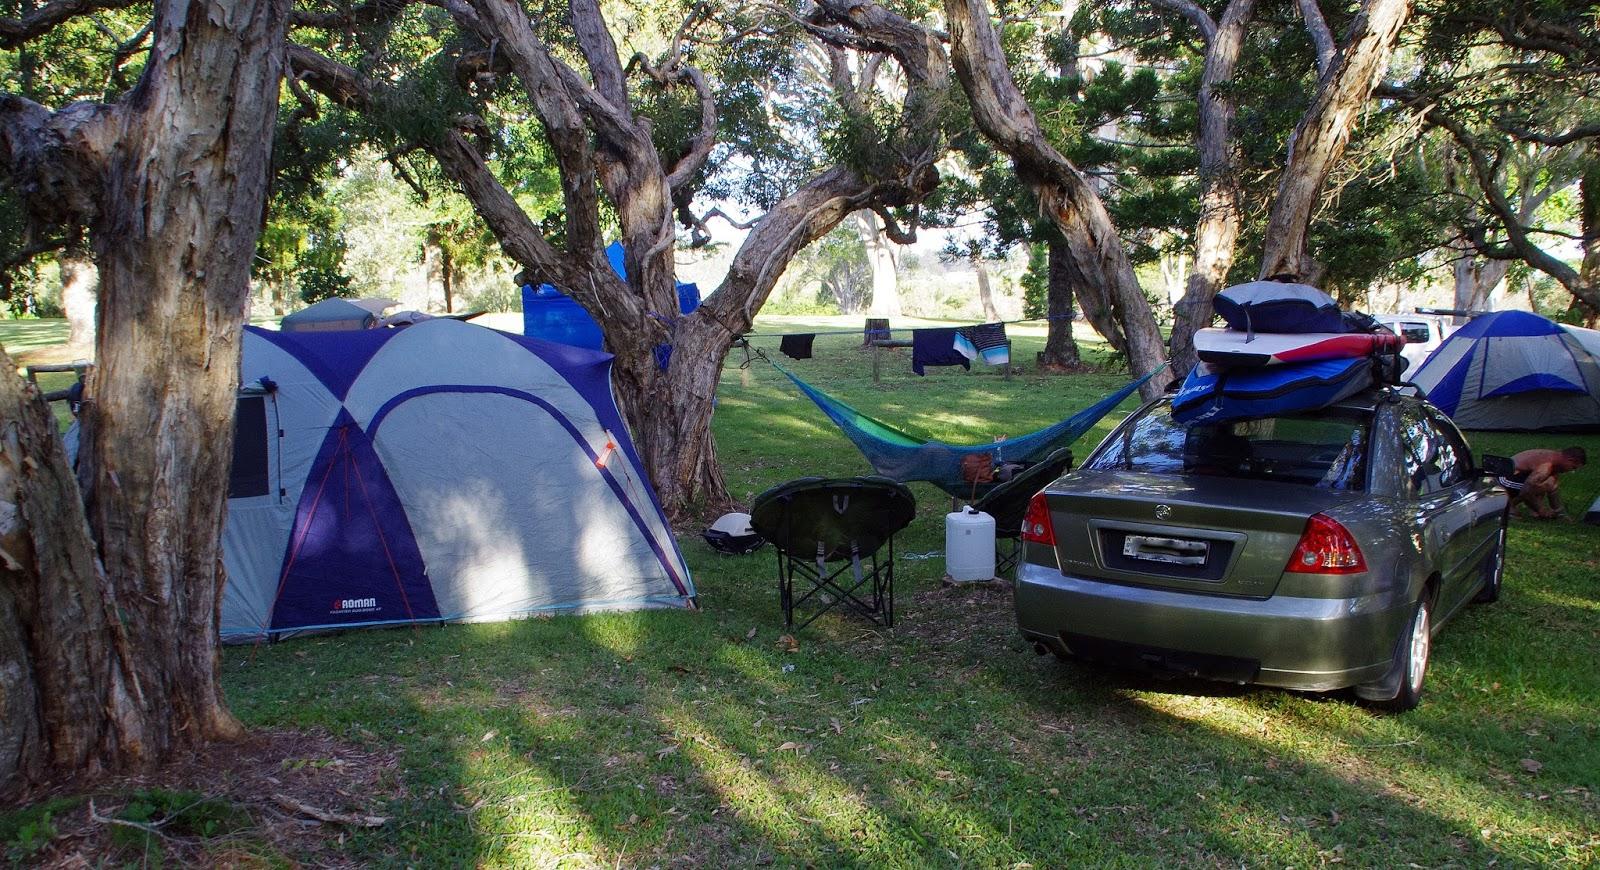 Camping on North Stradbroke Island